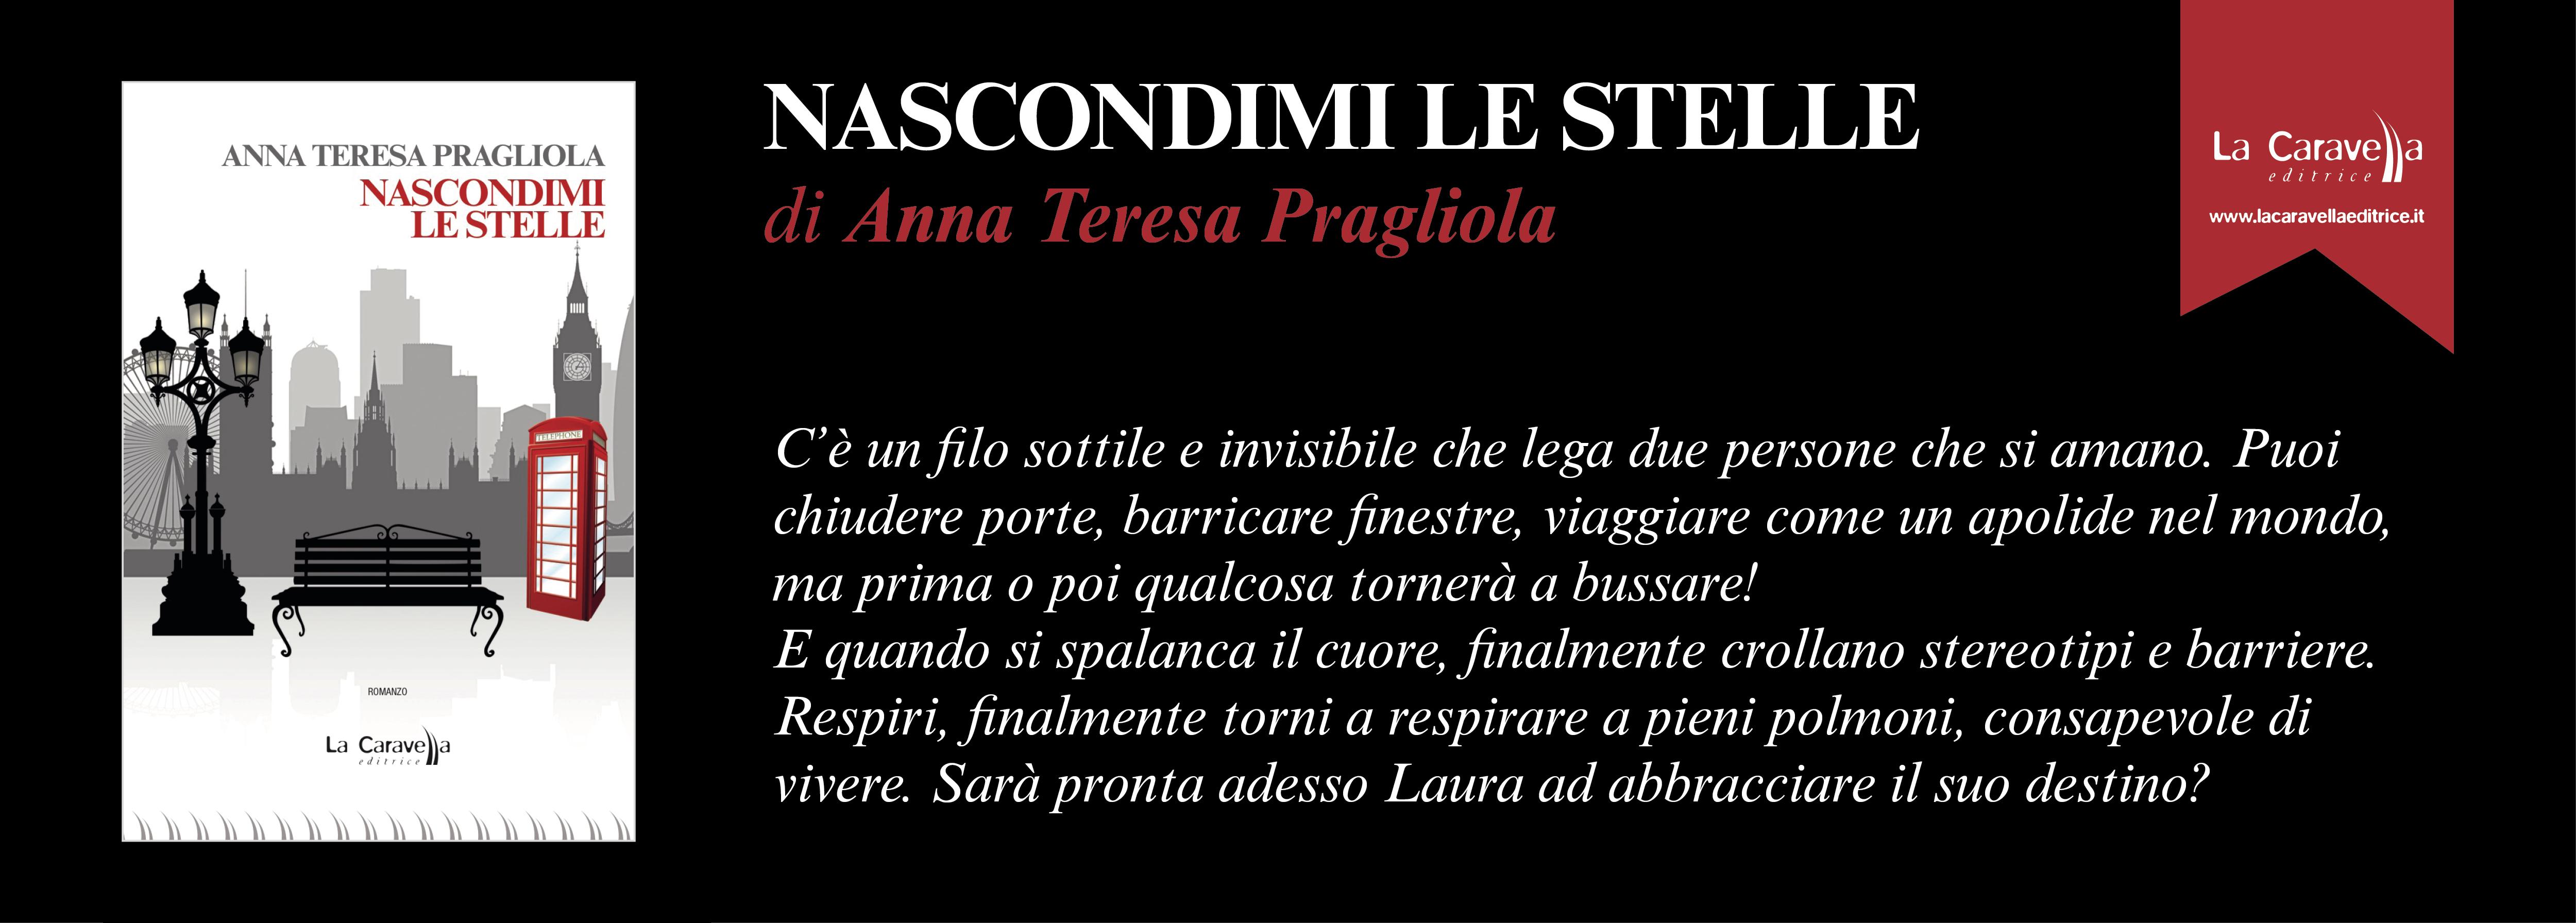 NASCONDIMI LE STELLE di Anna Teresa Pragliola